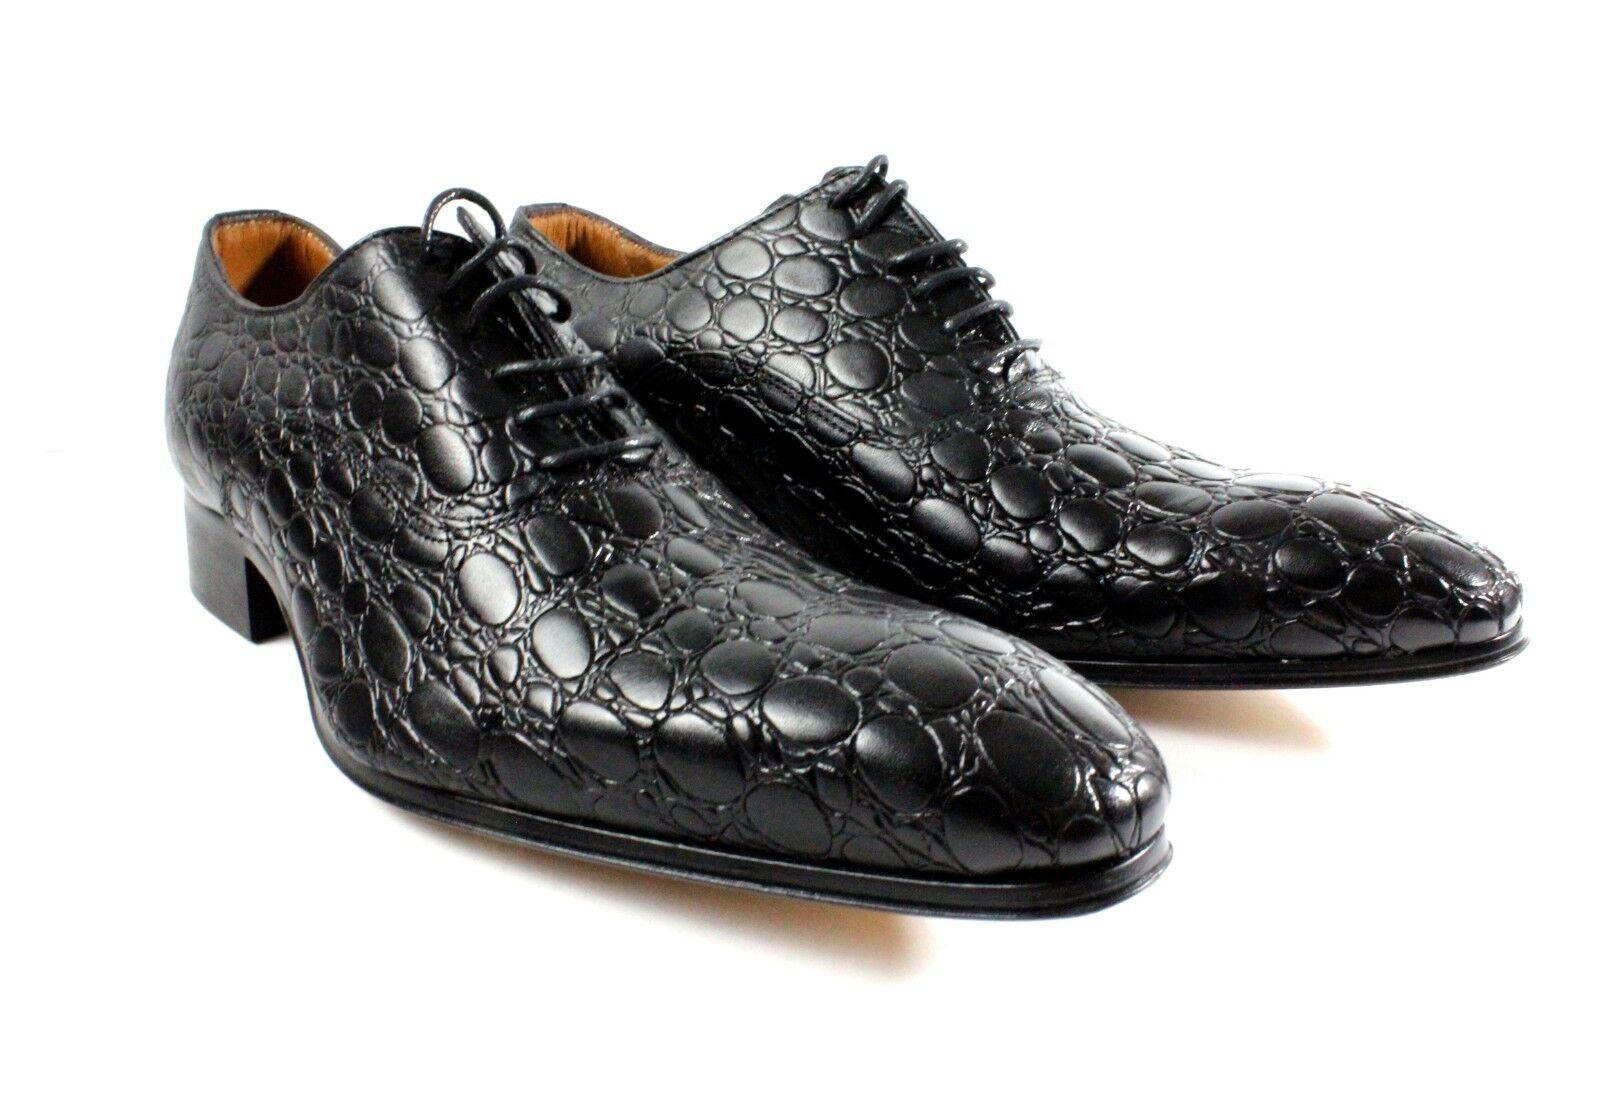 IVAN TROY Black Handmade Italian Leather Dress shoes Oxford shoes Men shoes